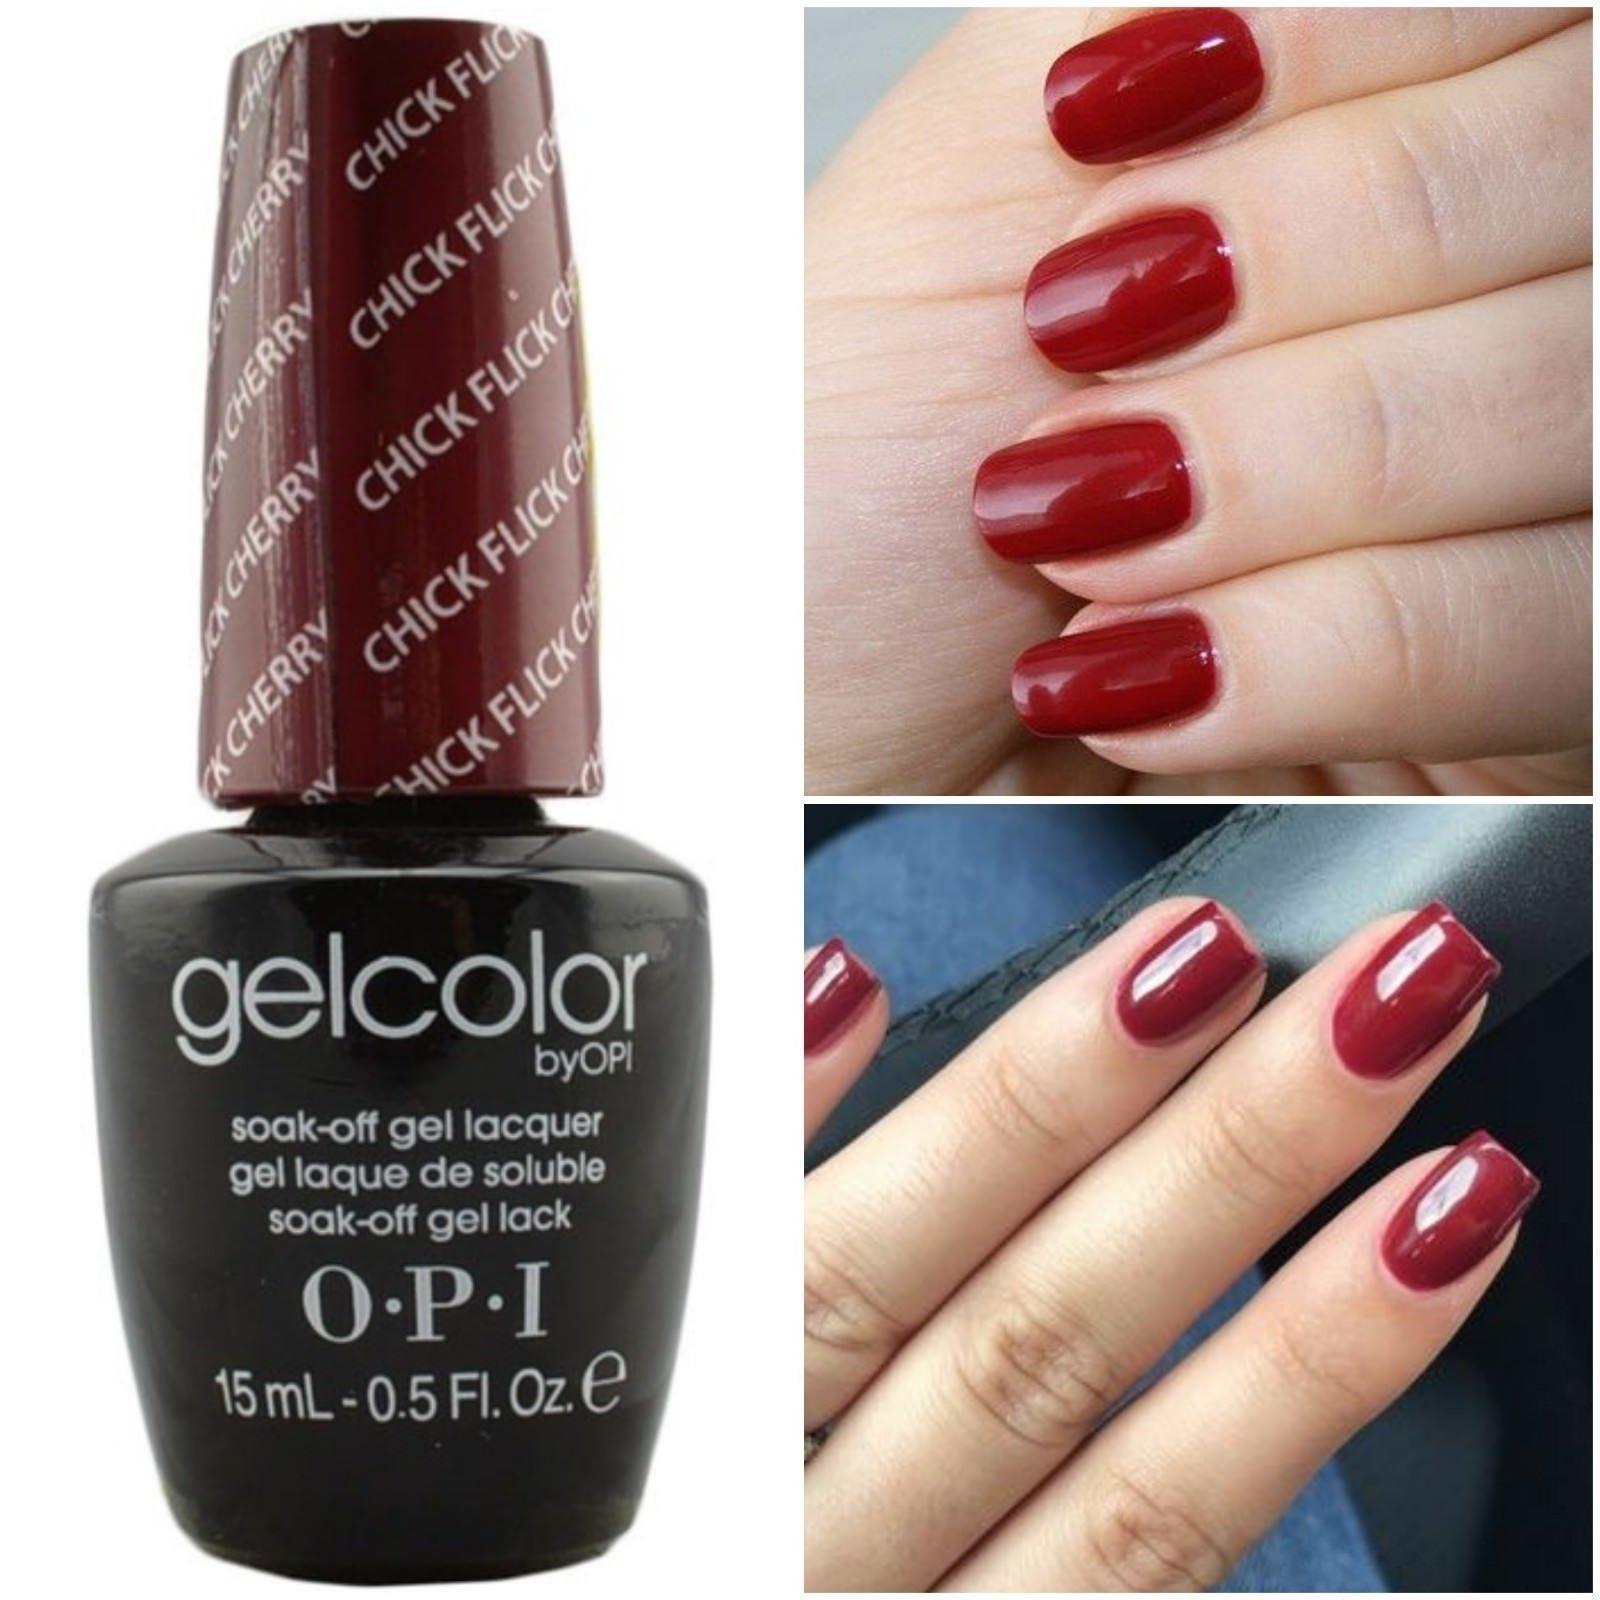 New Opi Gelcolor Soak Off Uv Led Gel Nail Polish 100 Authentic 0 5oz You Choose Nail Polish Opi Gel Nails Gel Color